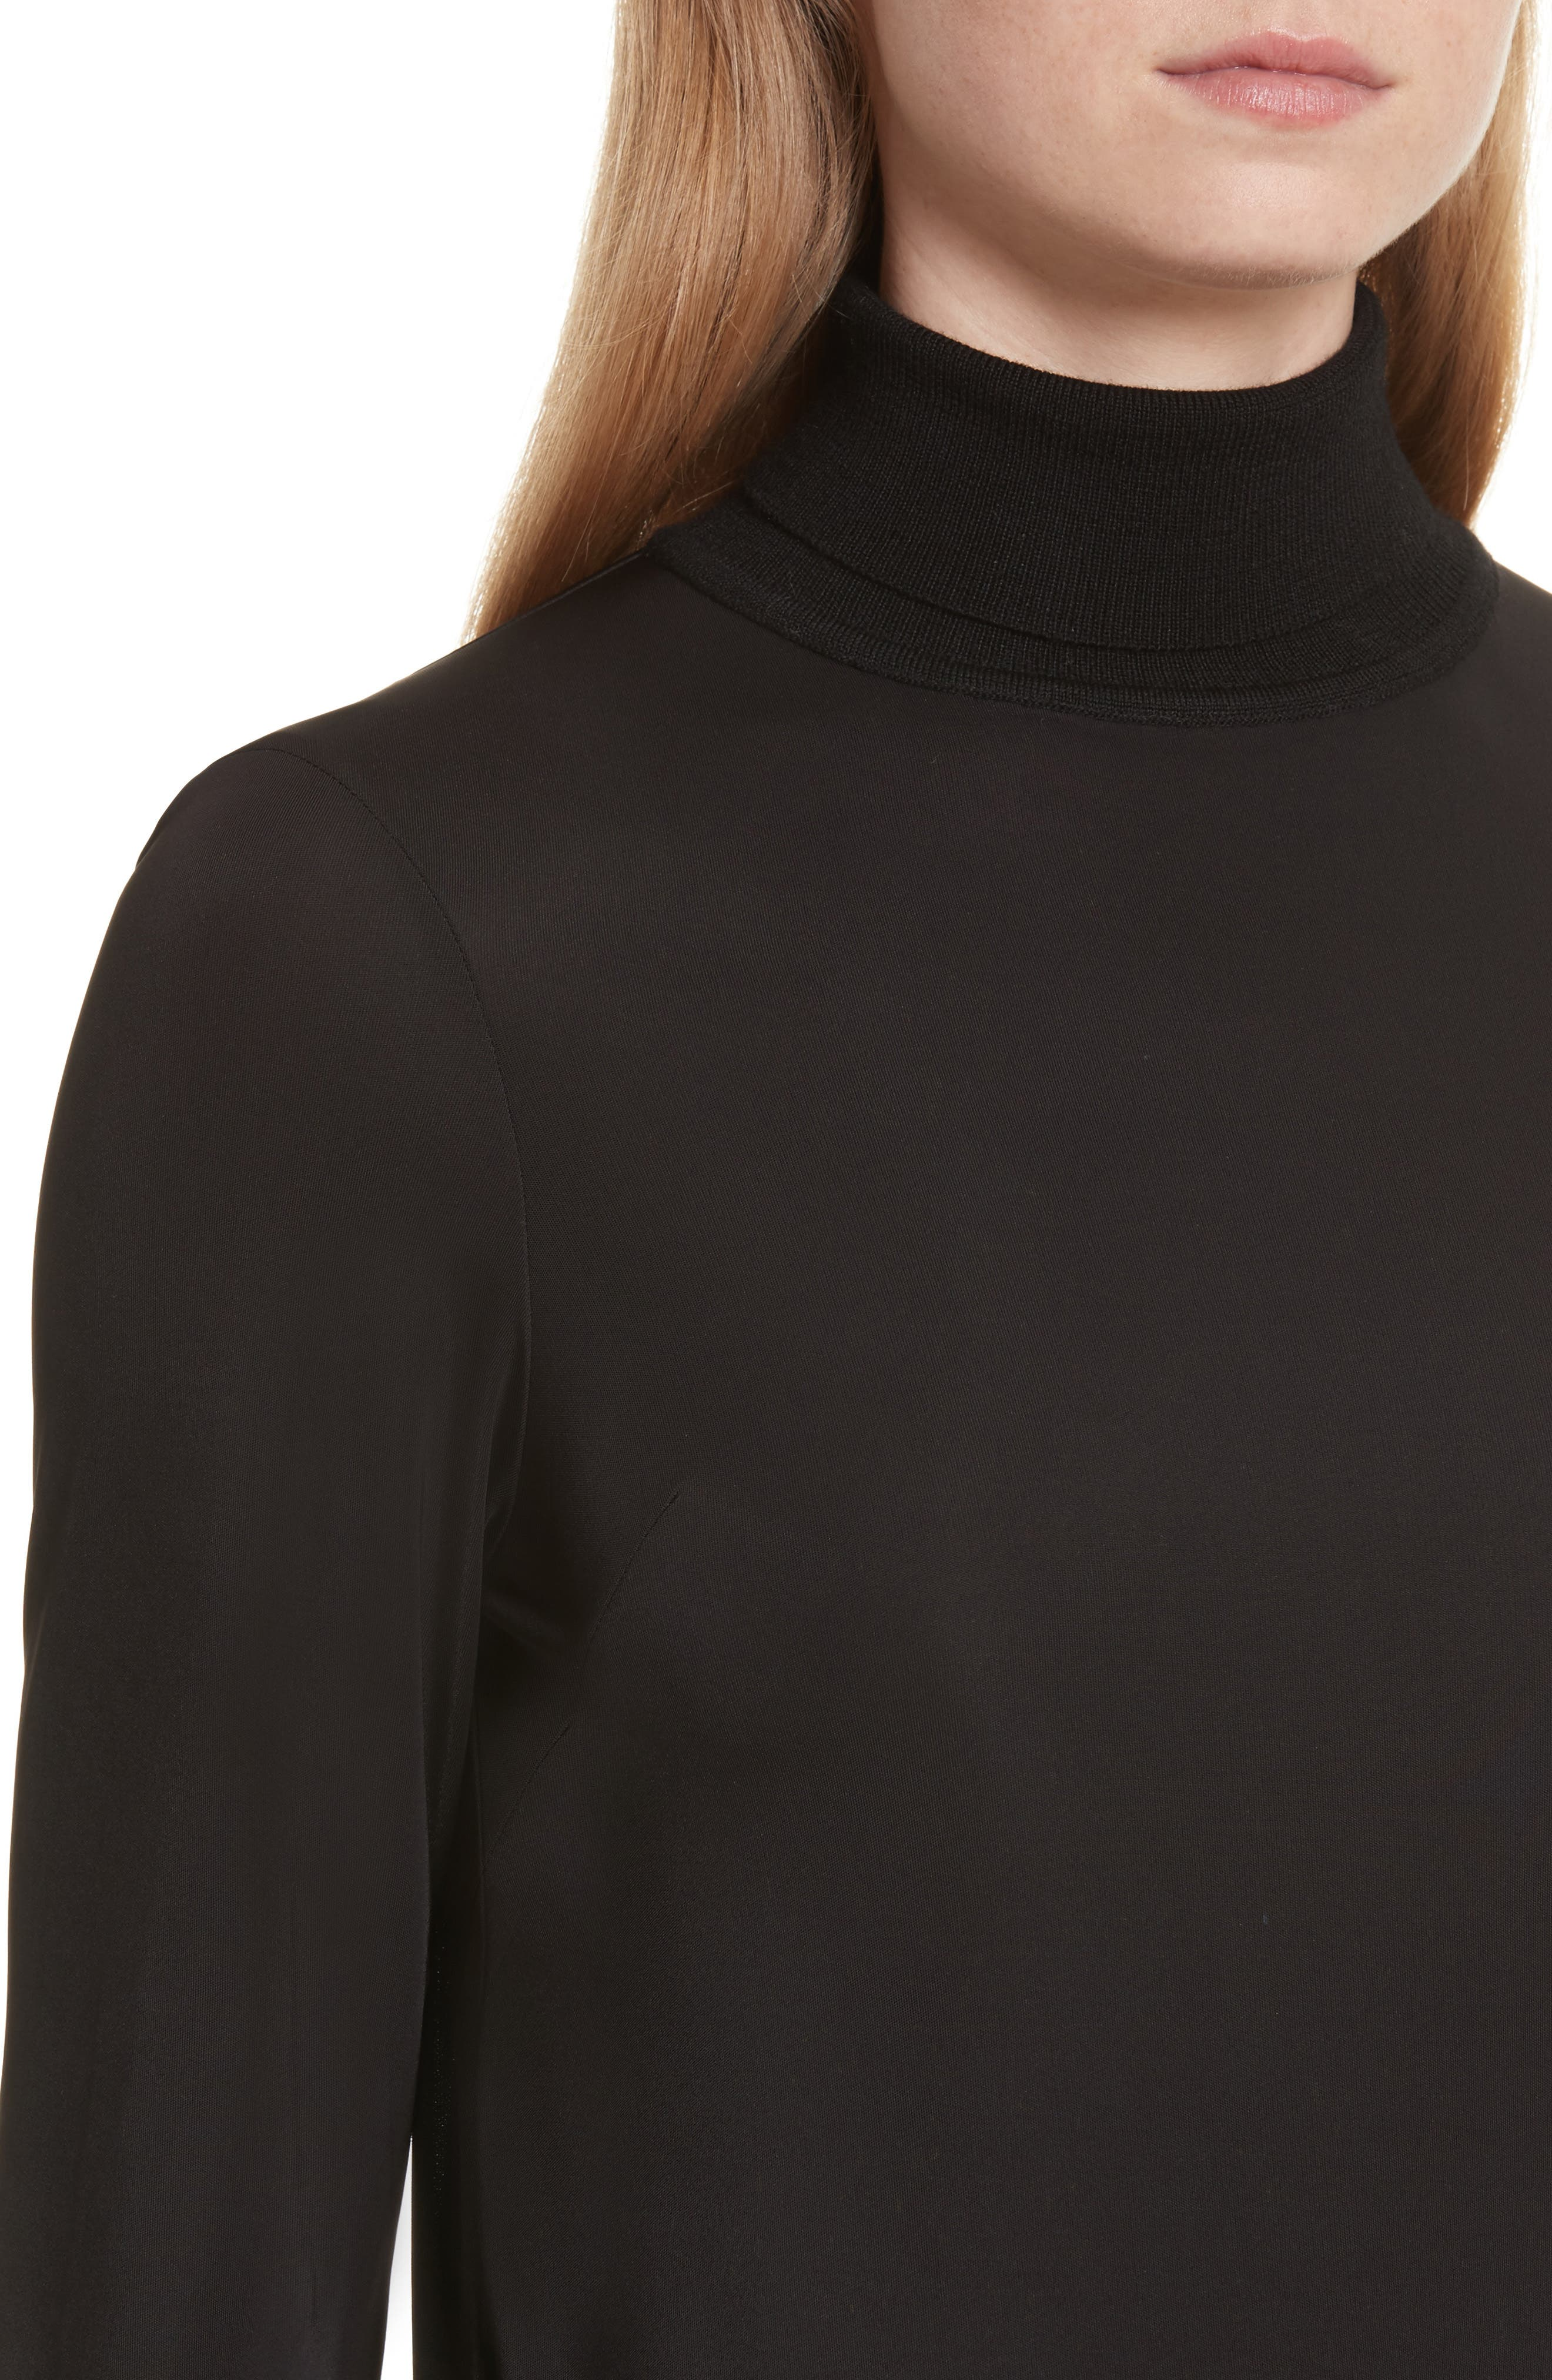 Merino Trim Turtleneck Sweater,                             Alternate thumbnail 7, color,